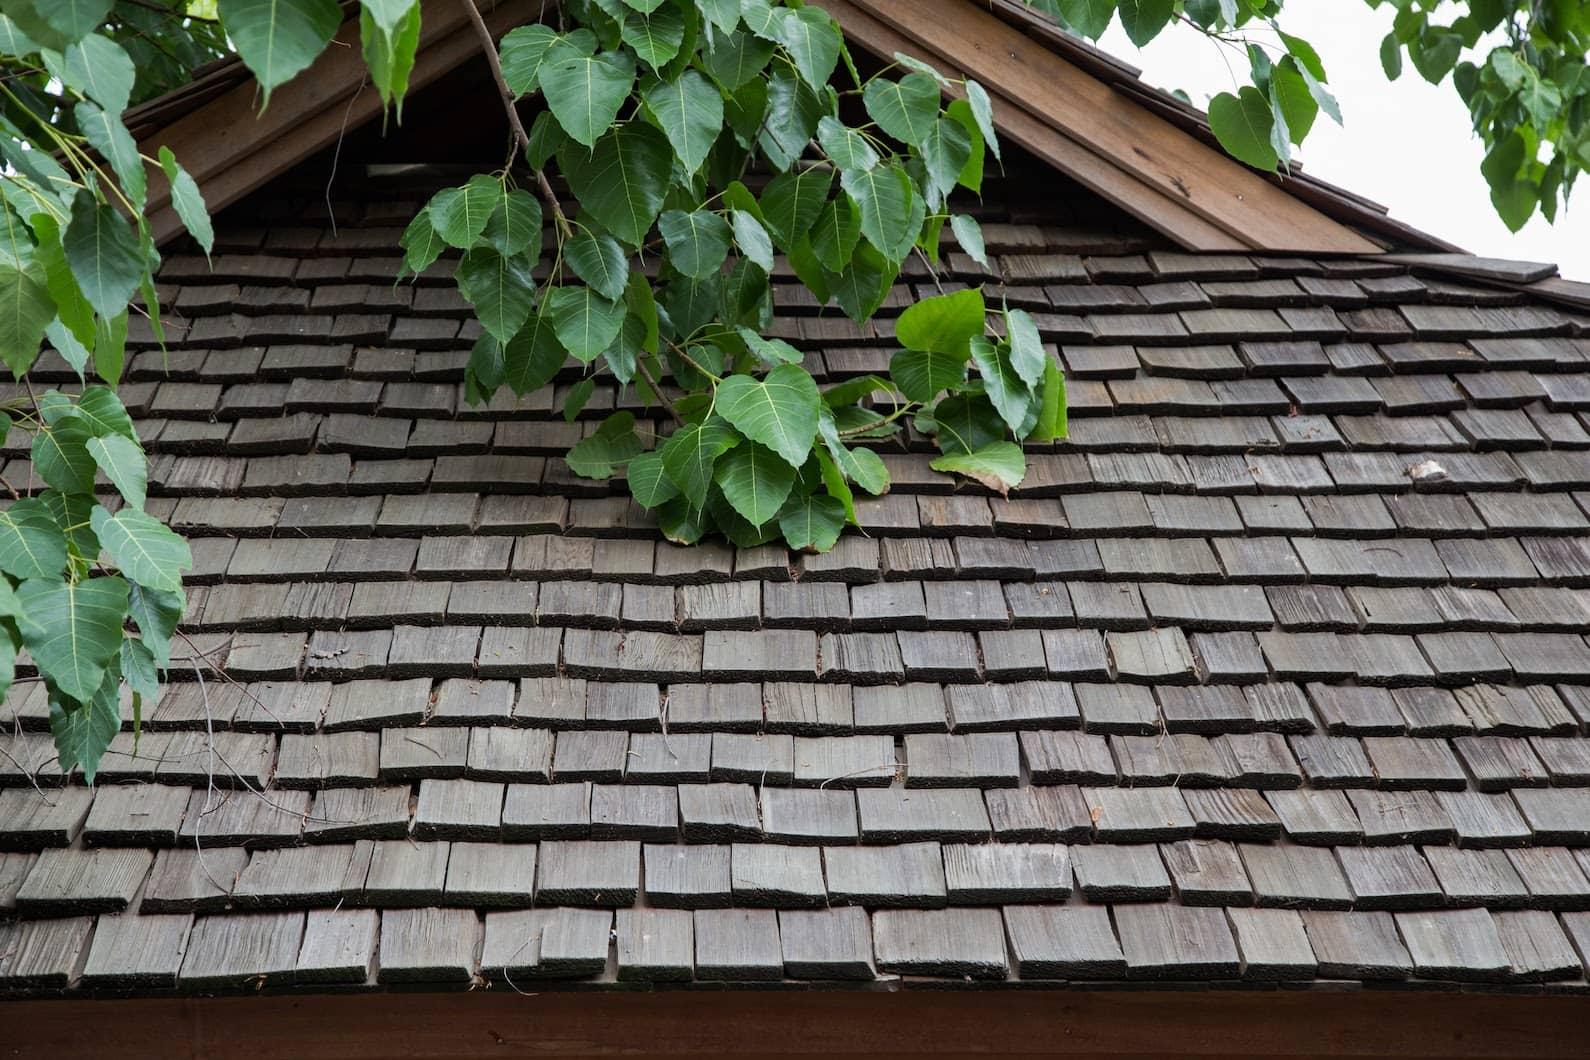 aging cedar shake roof